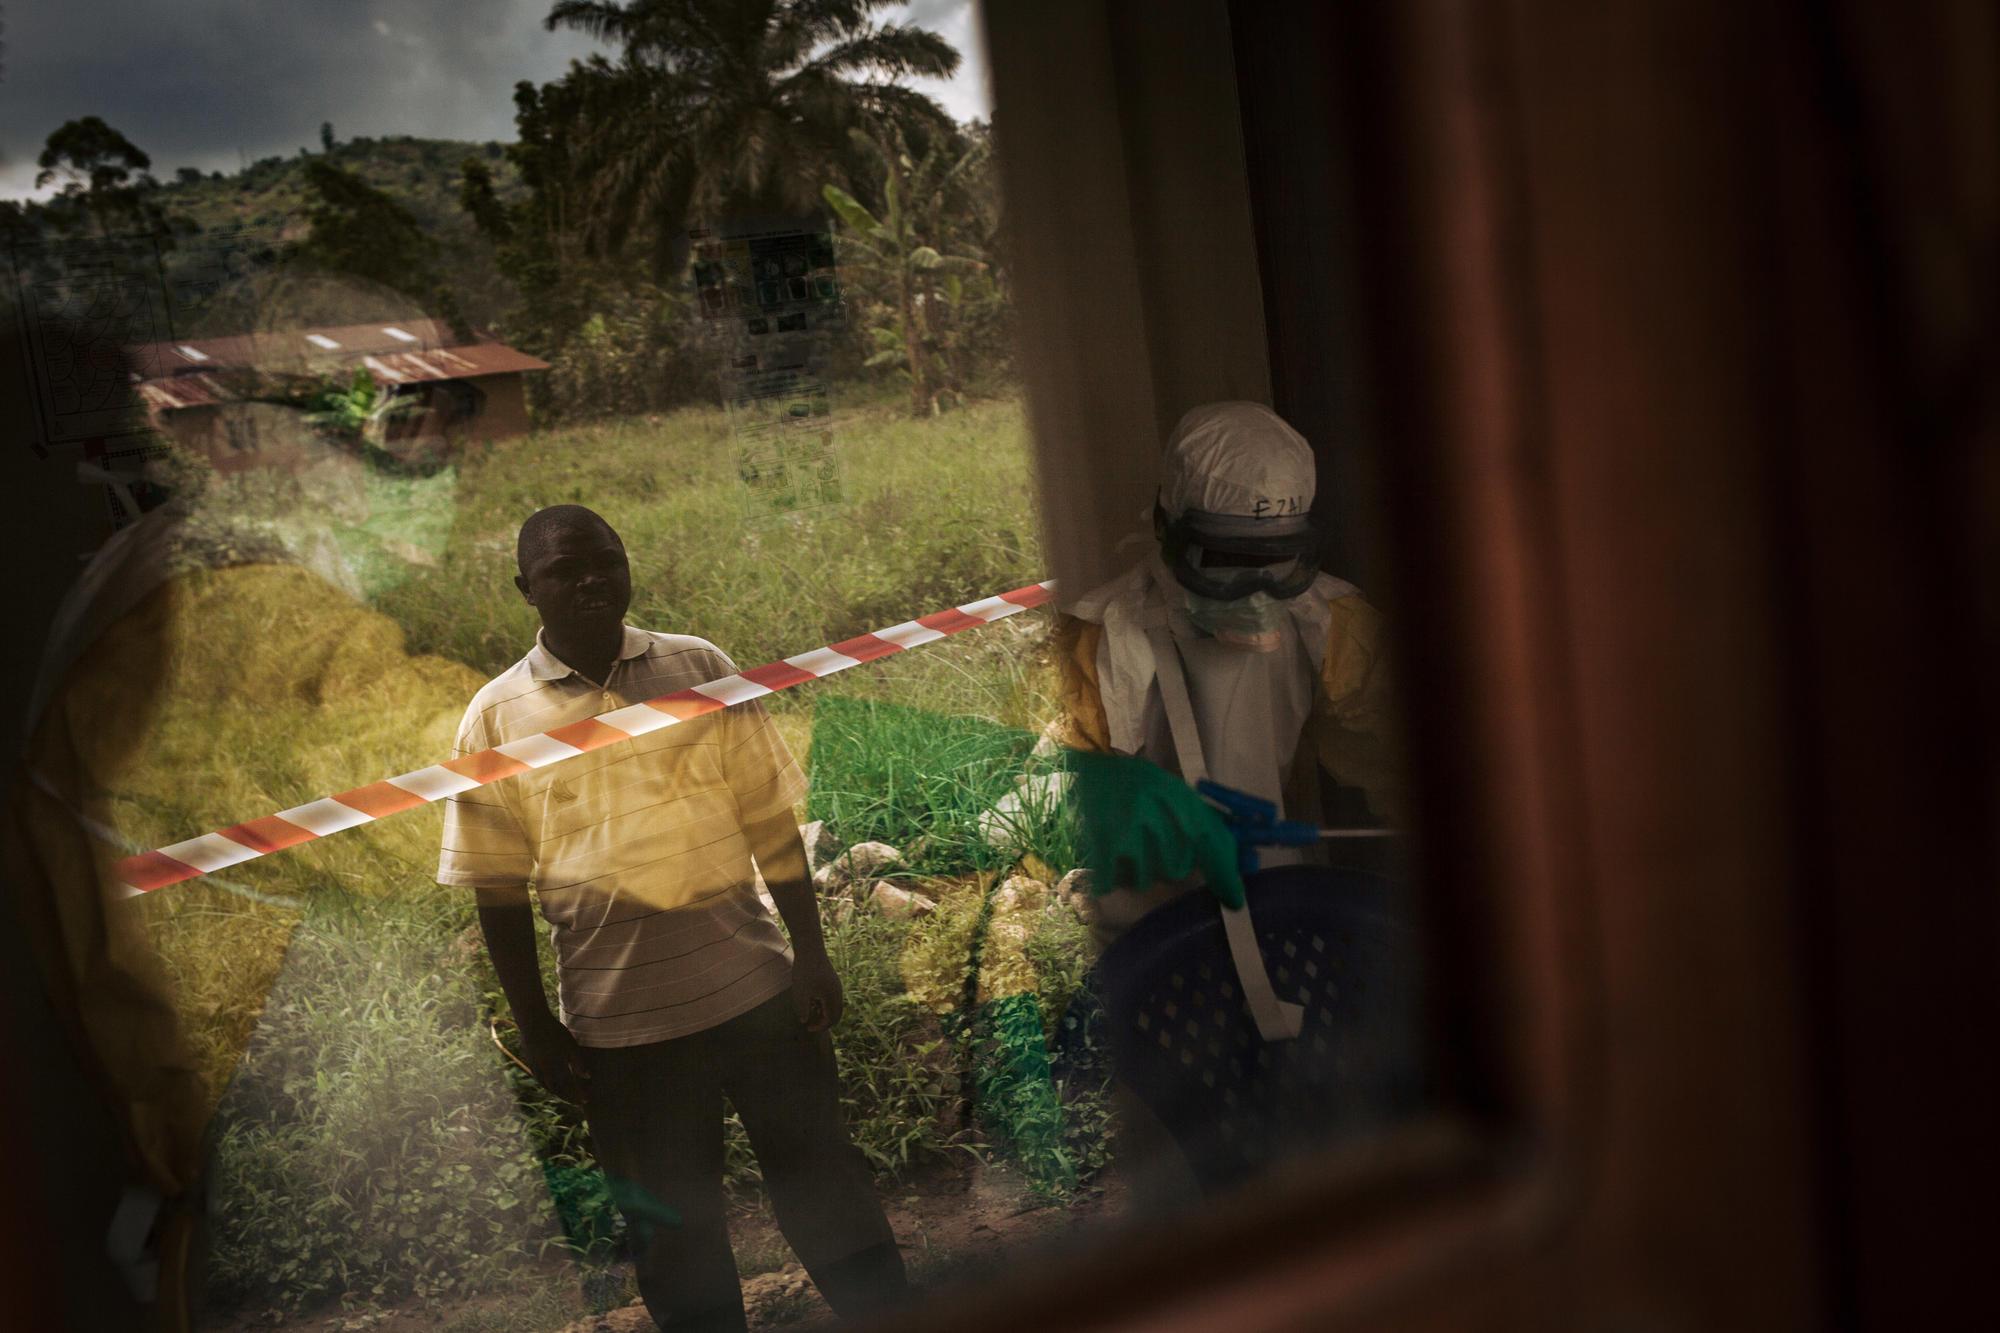 Ebola : MSF augmente ses activités en RDC dans un contexte de tensions croissantes